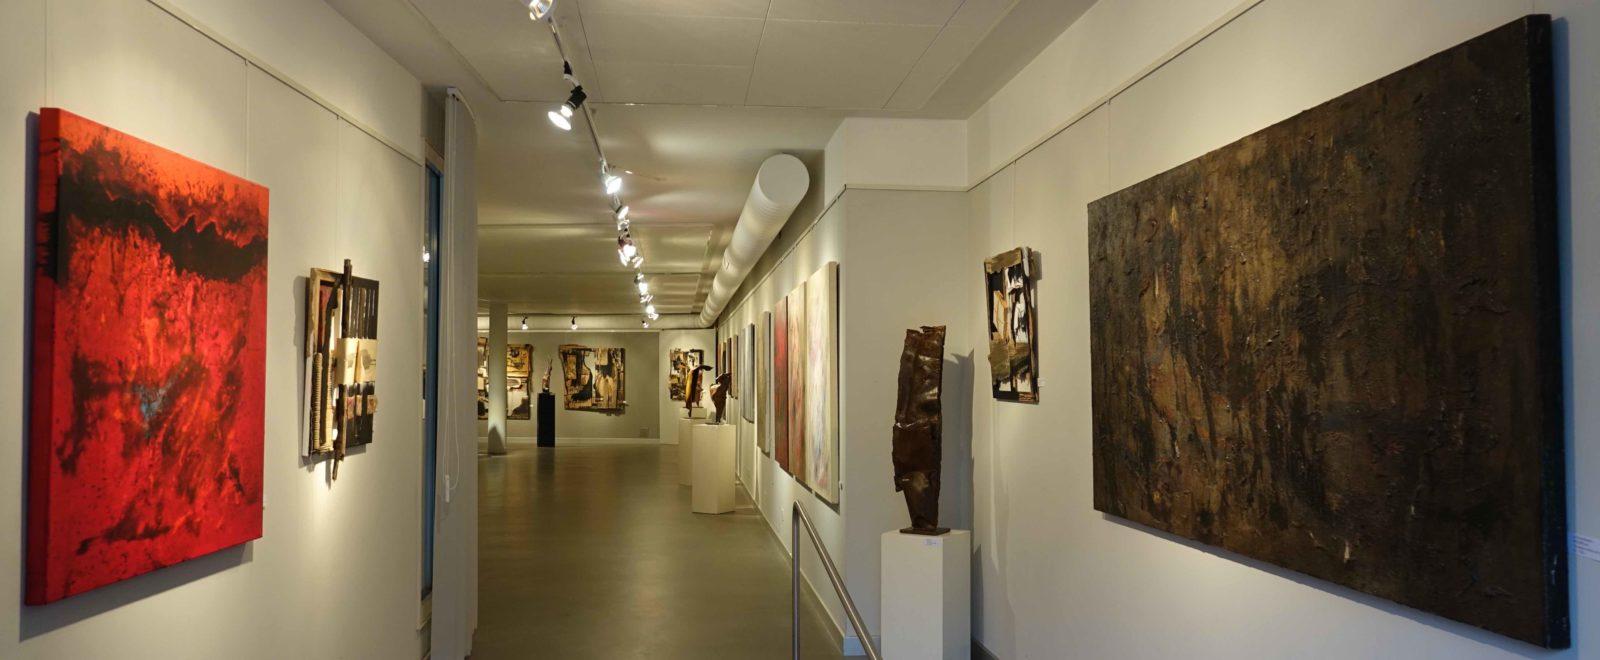 Exposition Jef Gianadda espace Murandaz Nyon